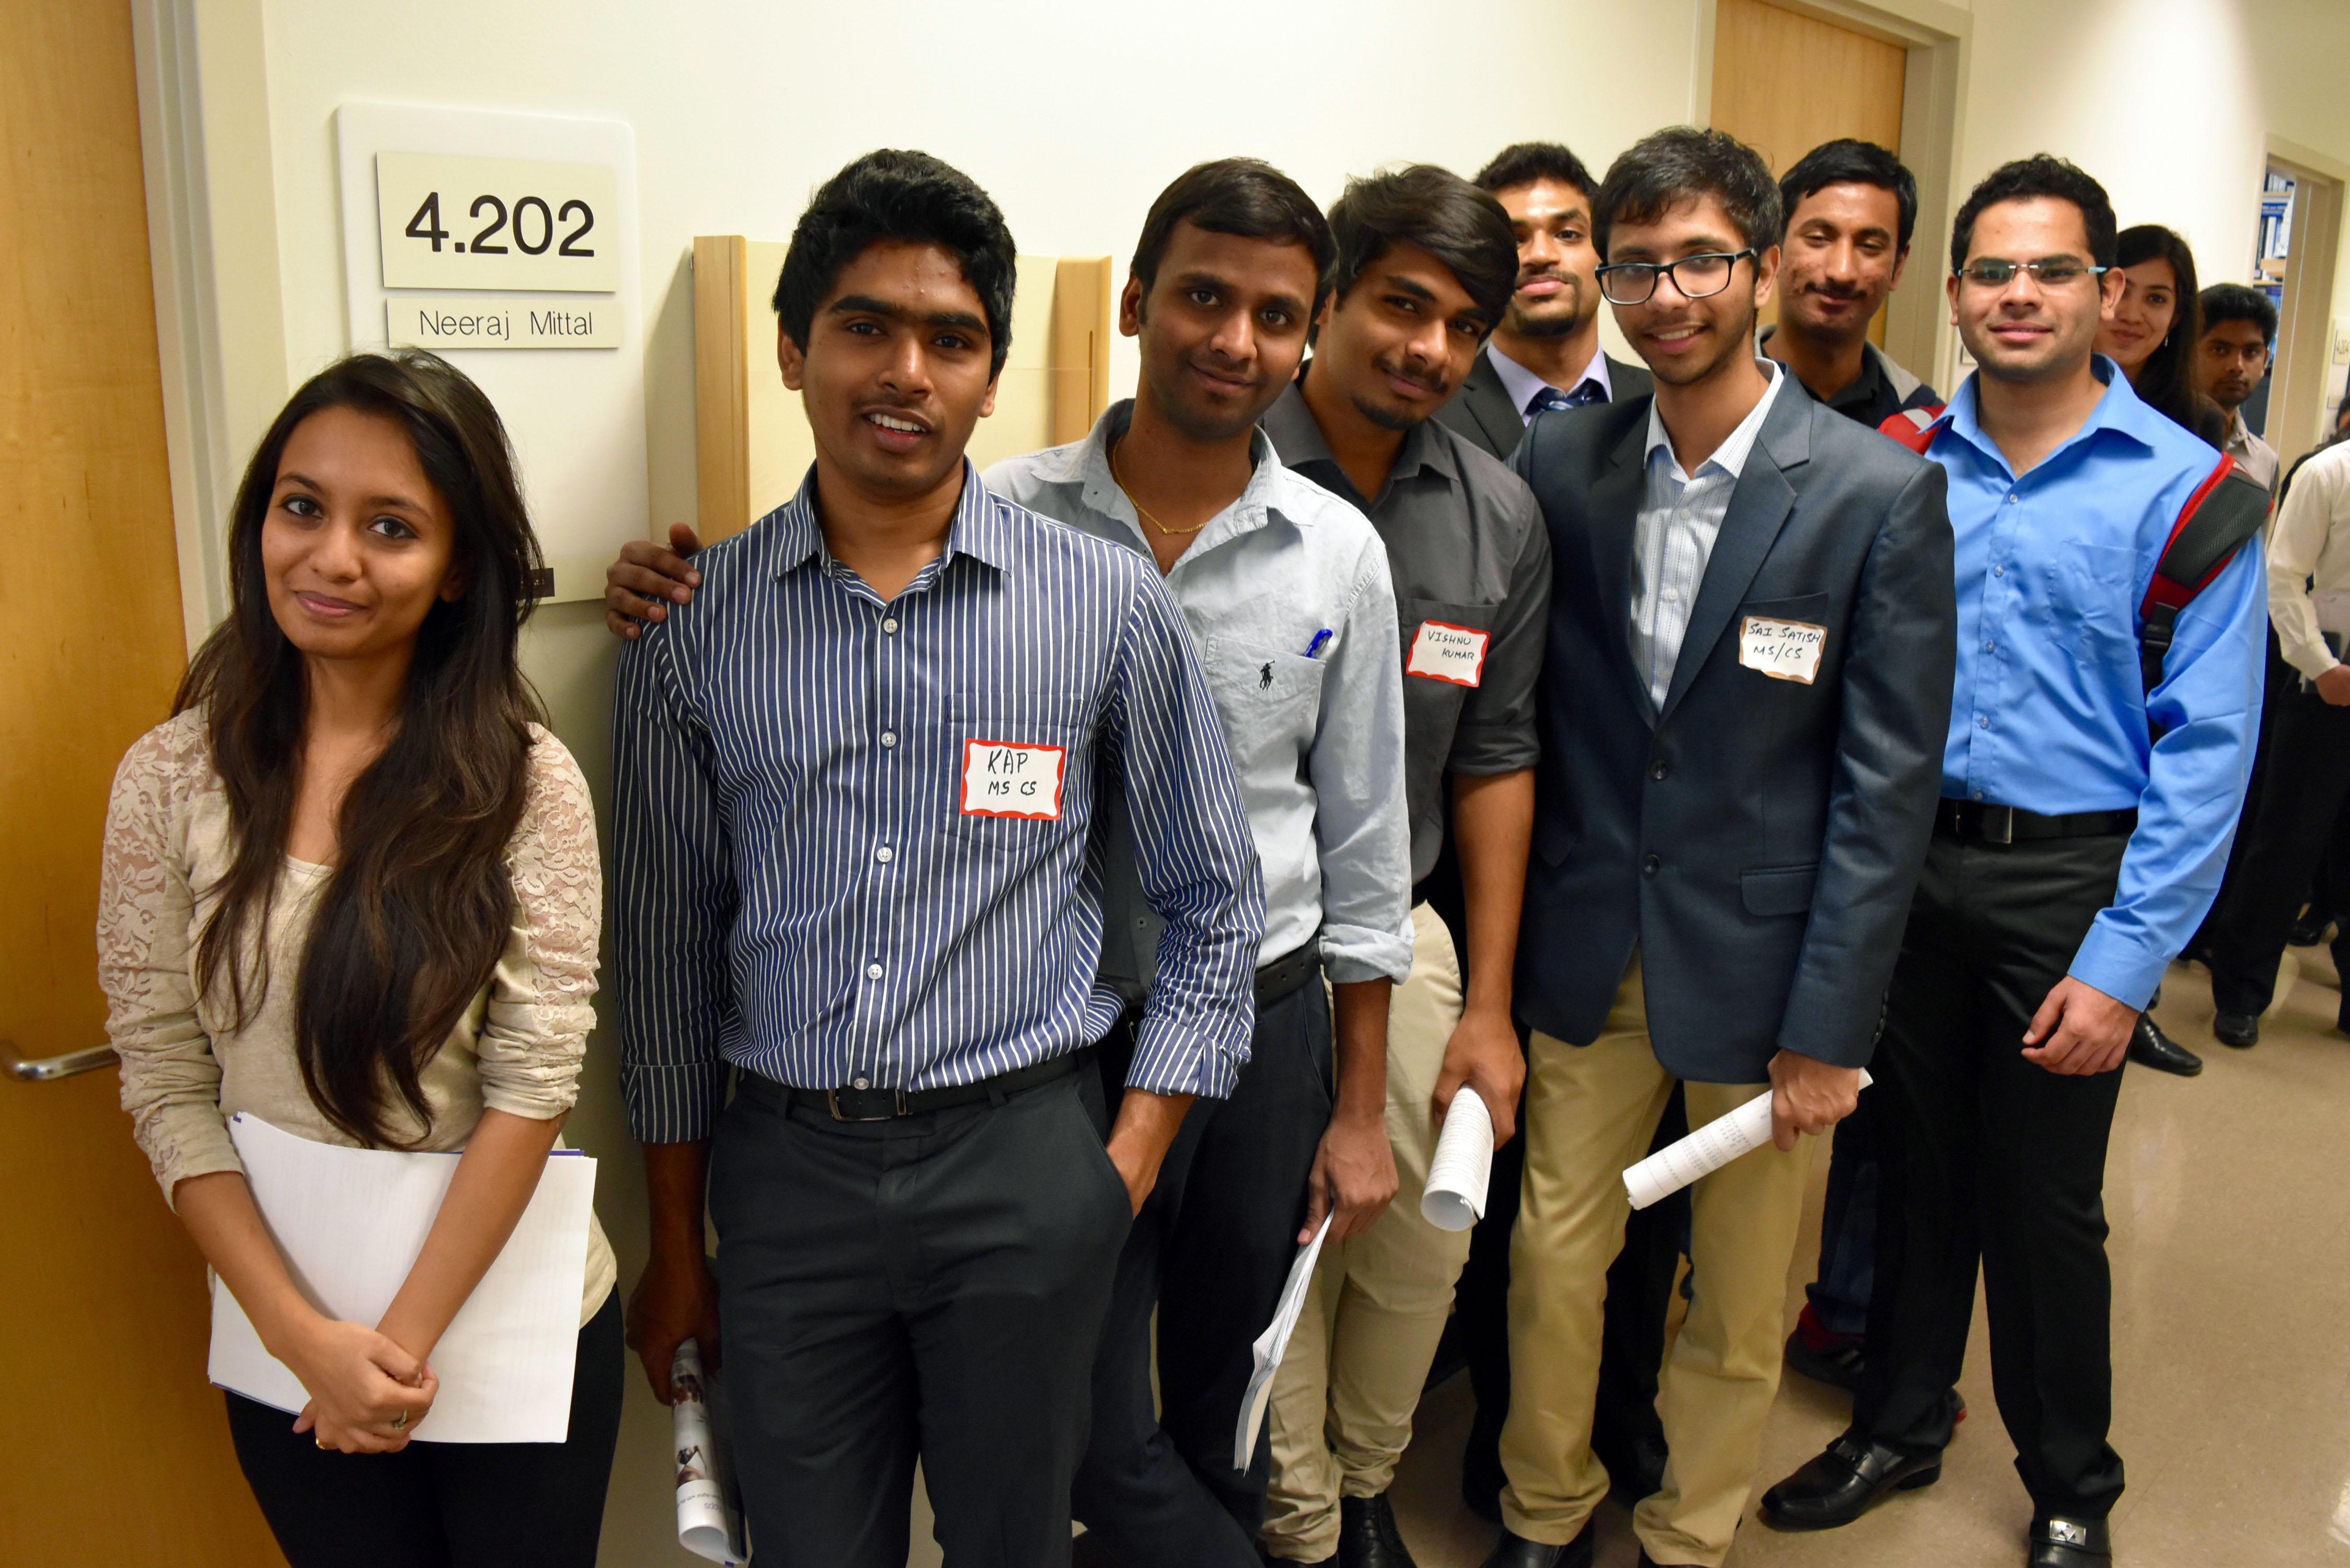 Student Internship Program - Jobs & Careers at TPWD - TPWD